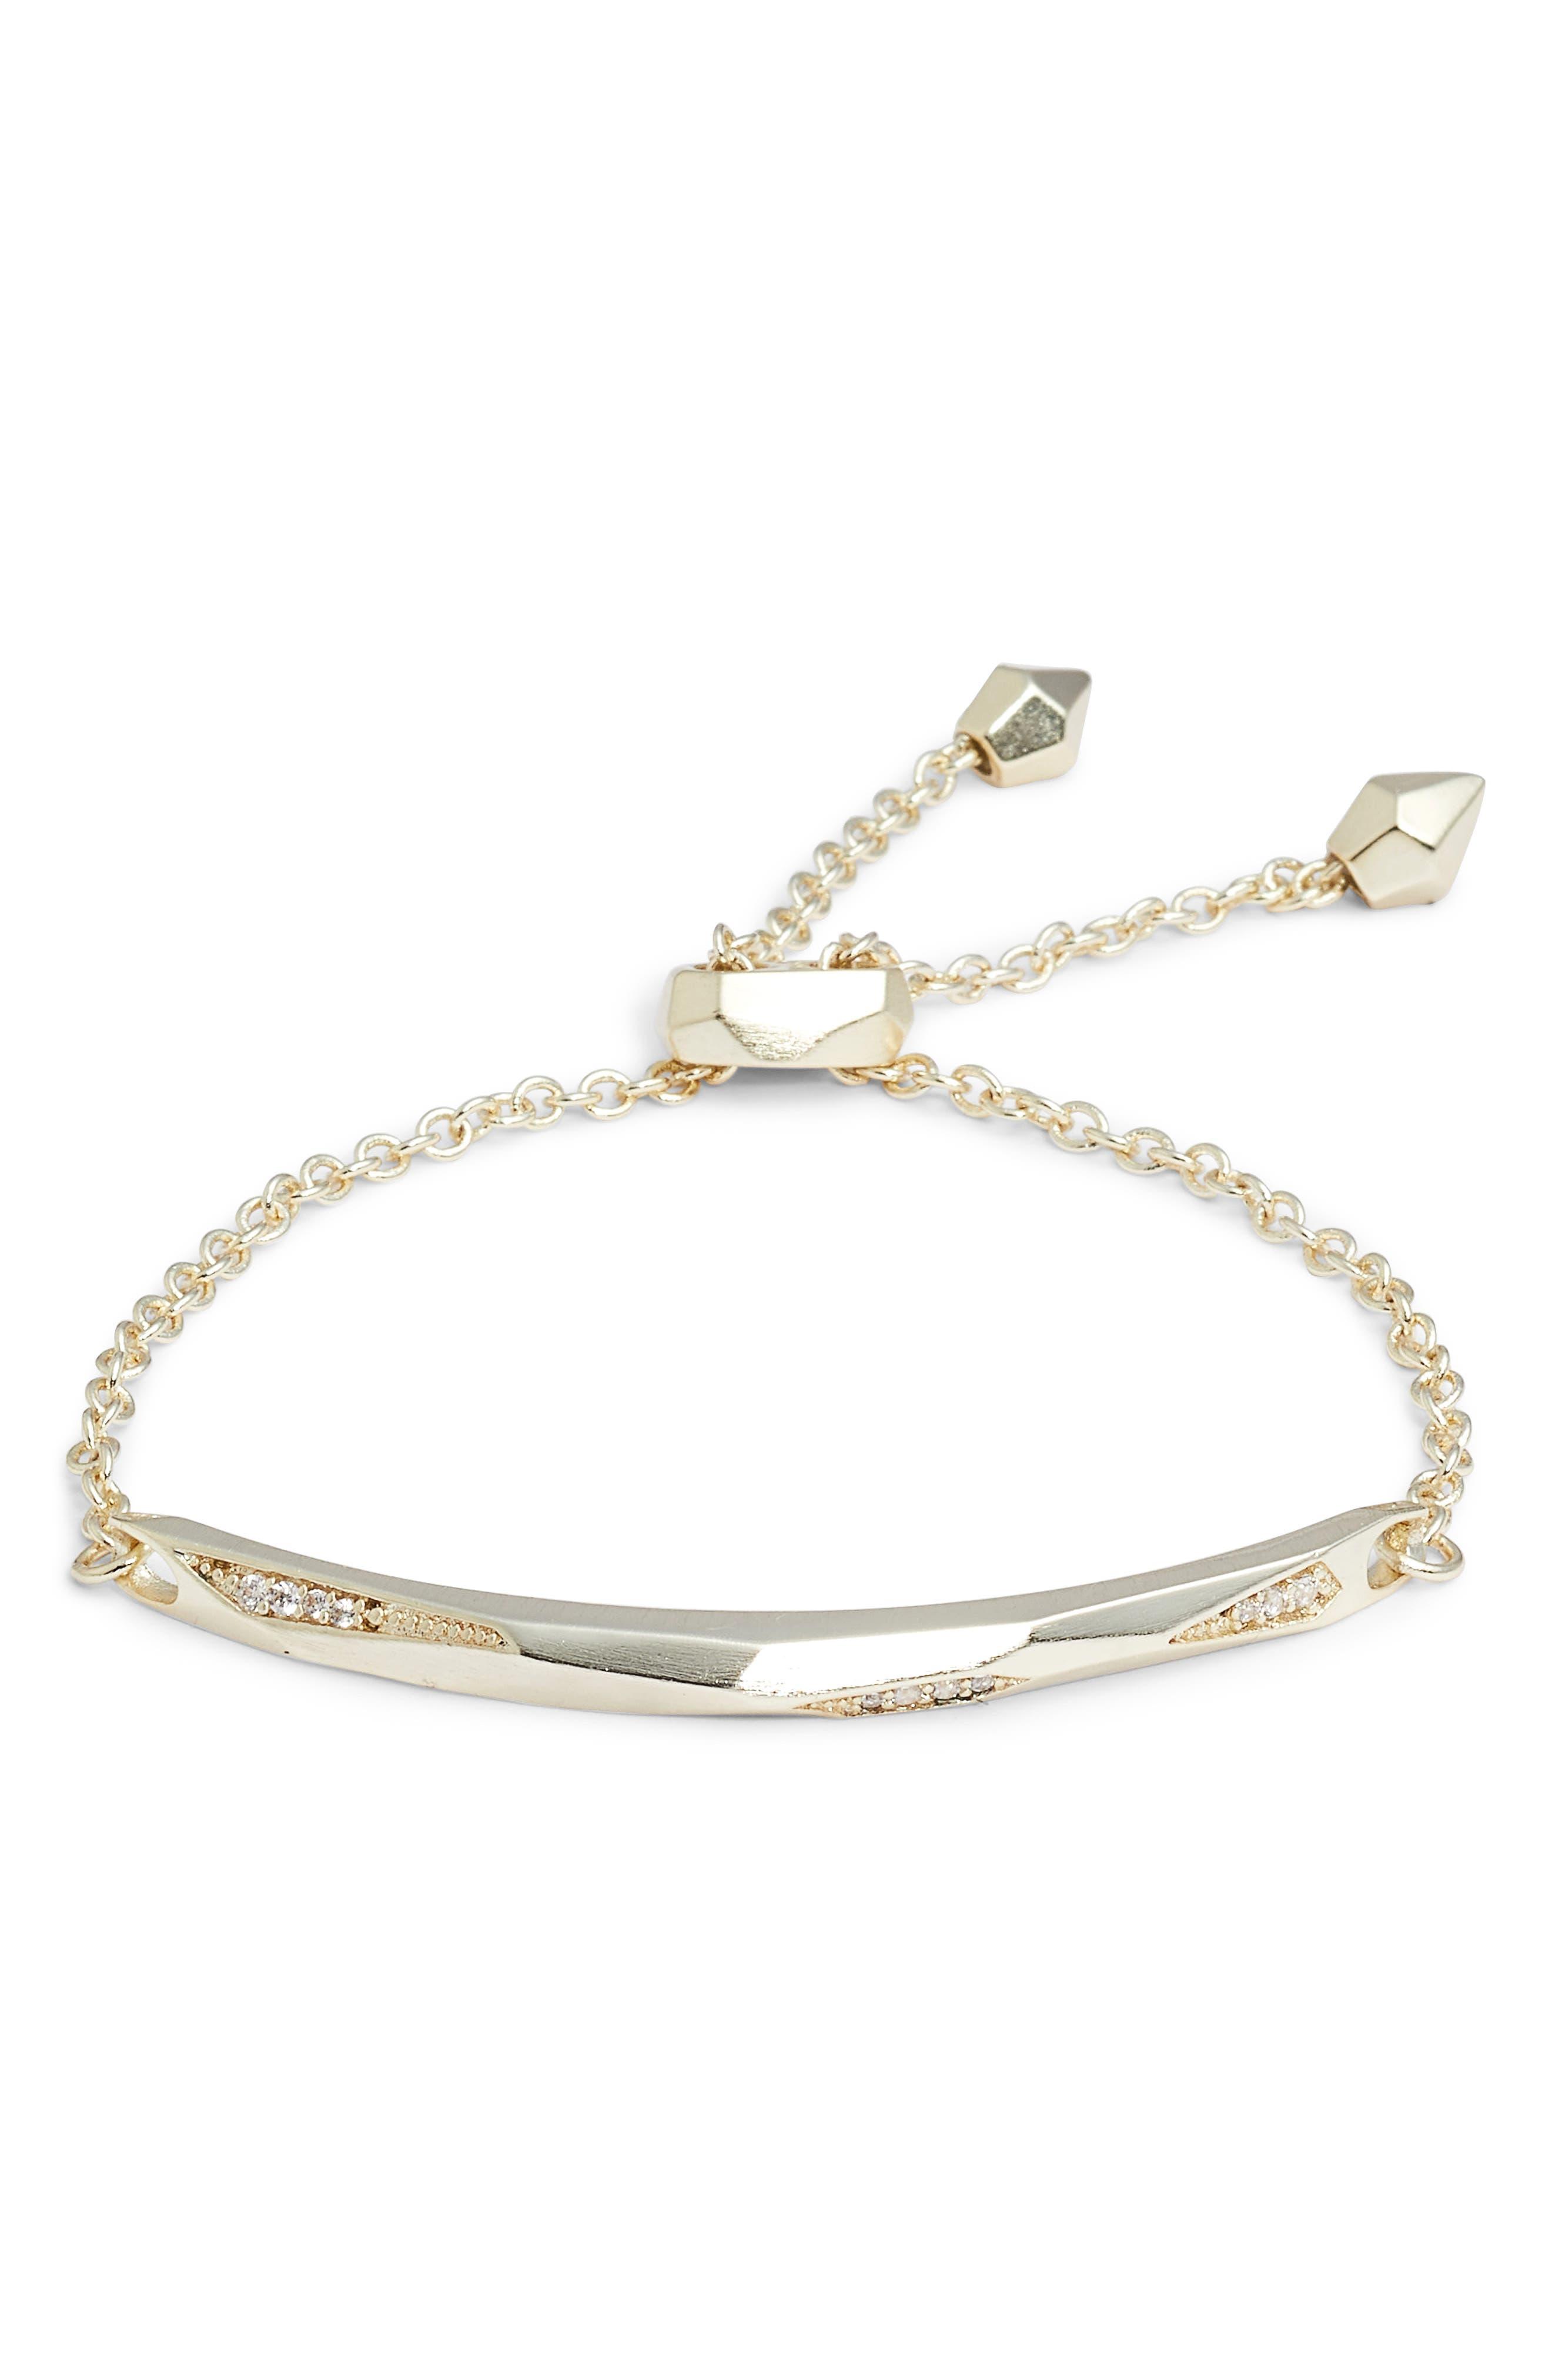 Angela Bracelet,                         Main,                         color, White Cz/ Gold